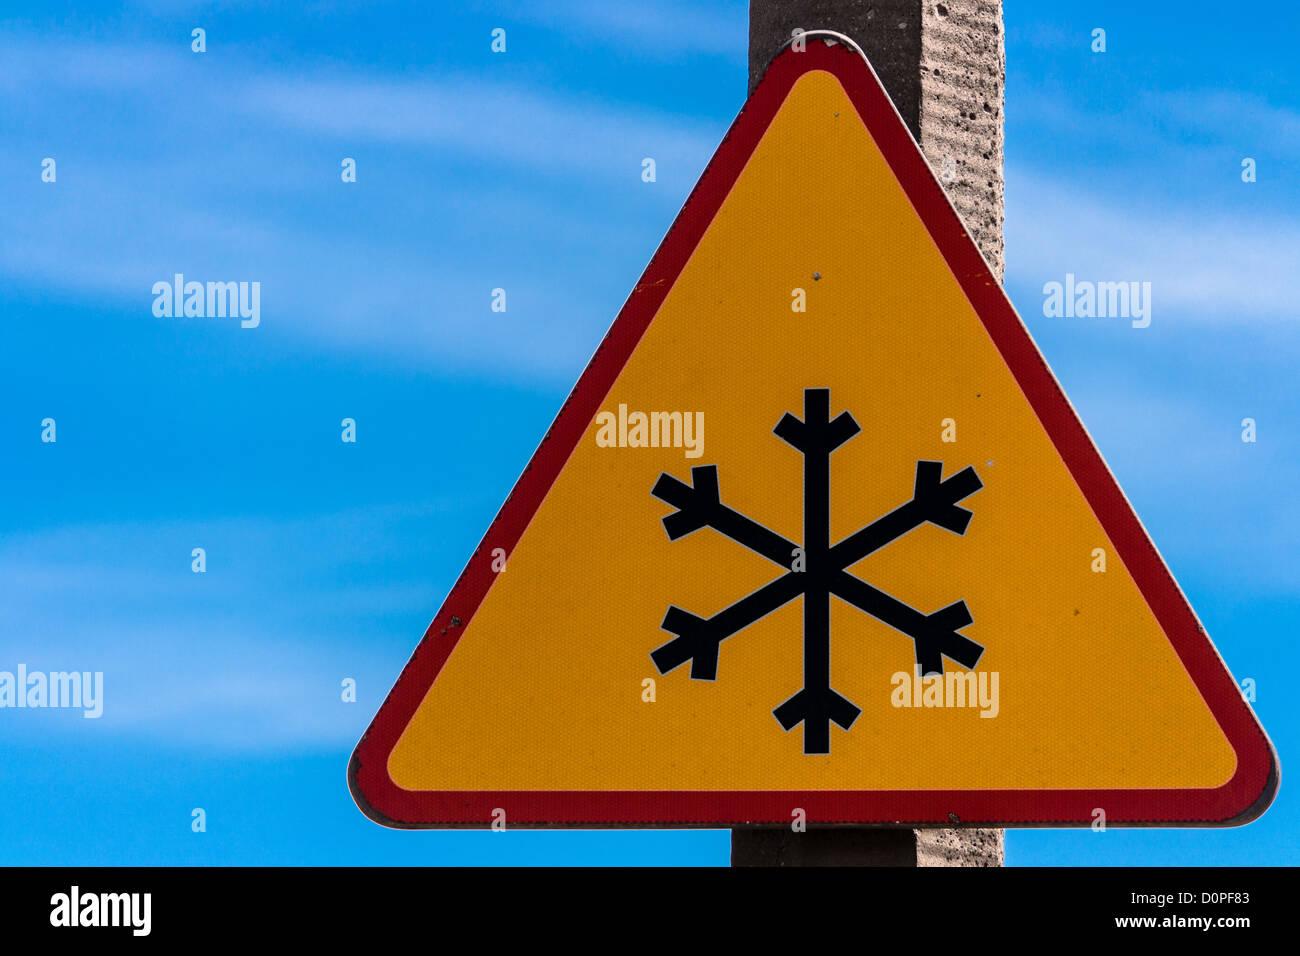 Warning snow - Stock Image